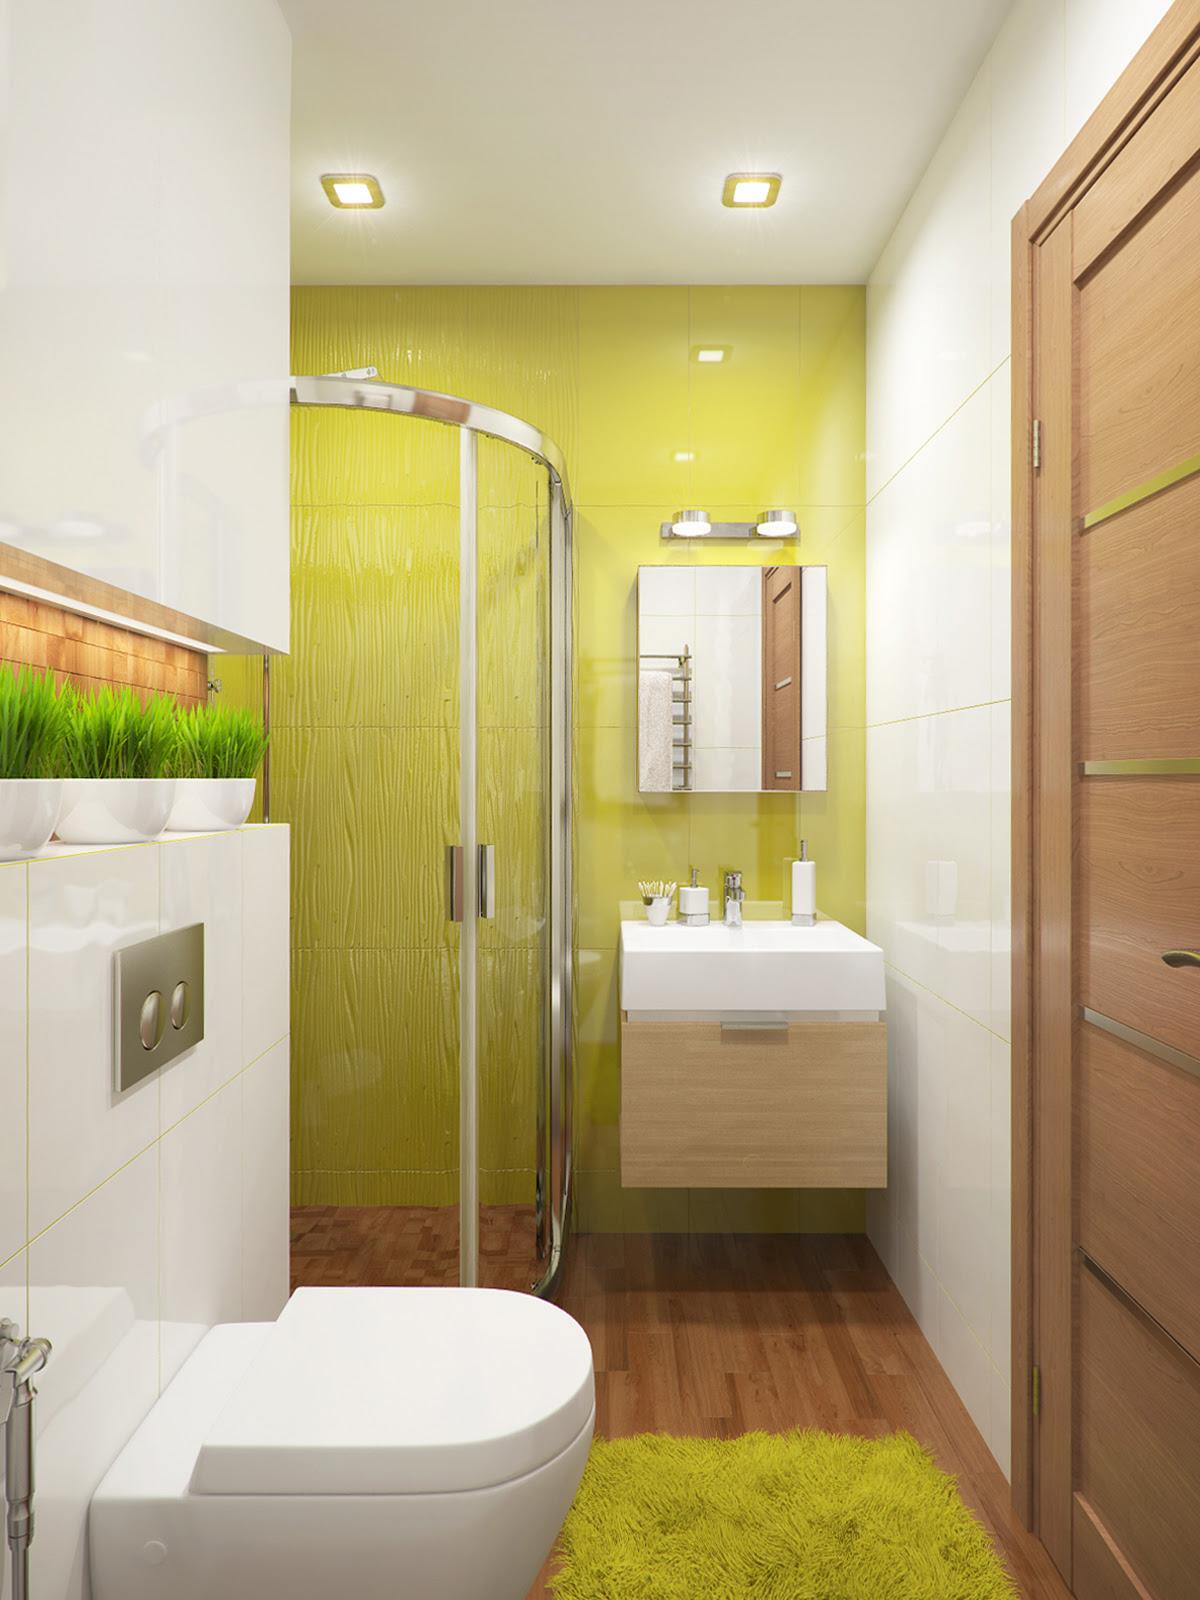 Decorating Minimalist Bathroom Designs Look So Beautiful ...